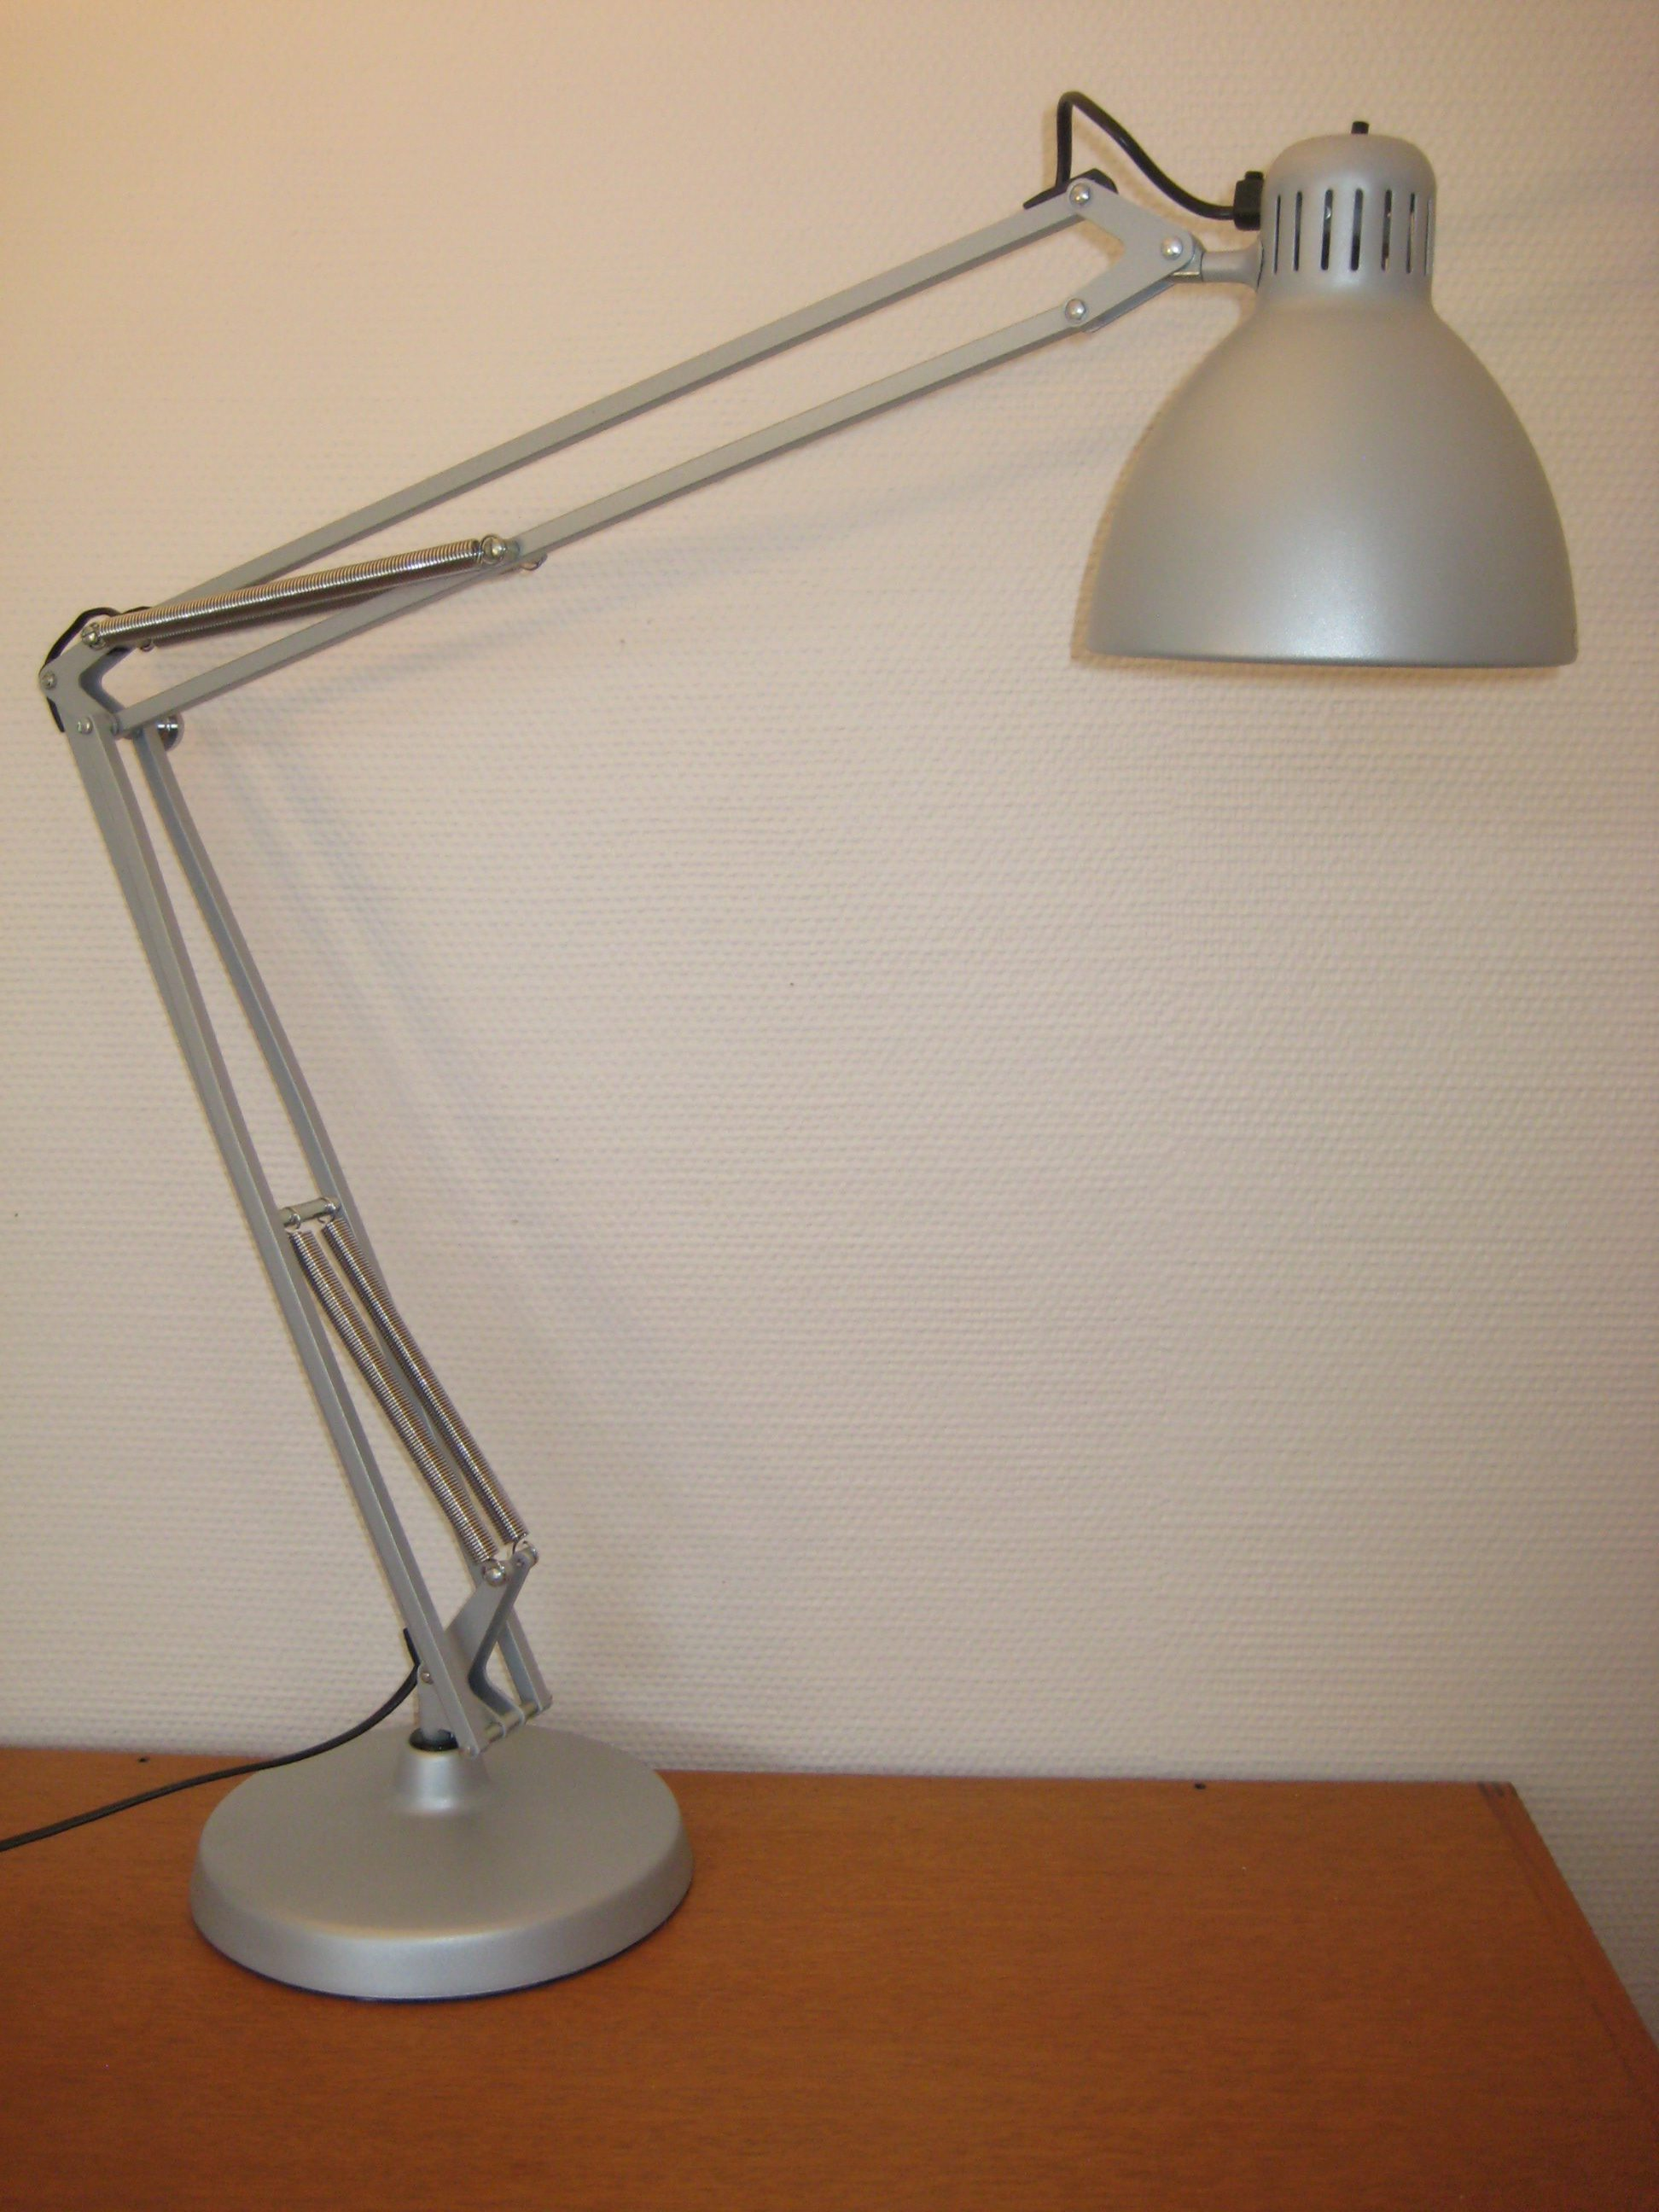 Luxo arkitektlampe, silver